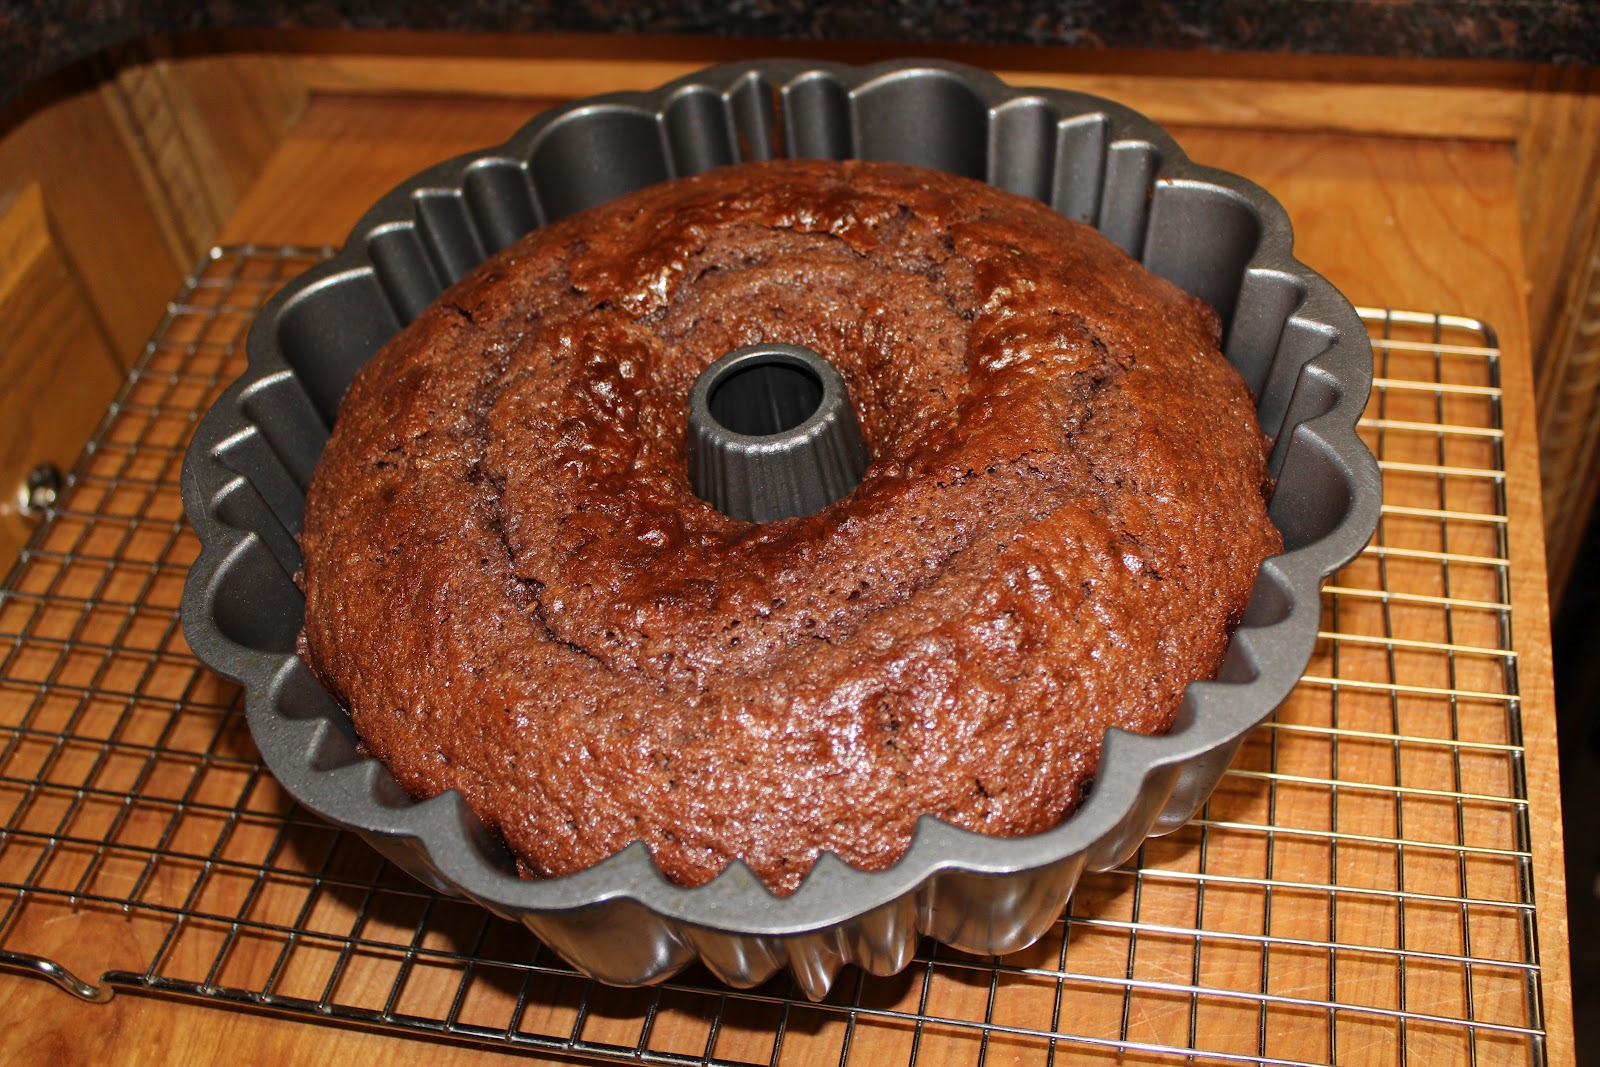 Michelle S Tasty Creations German Chocolate Bundt Cake